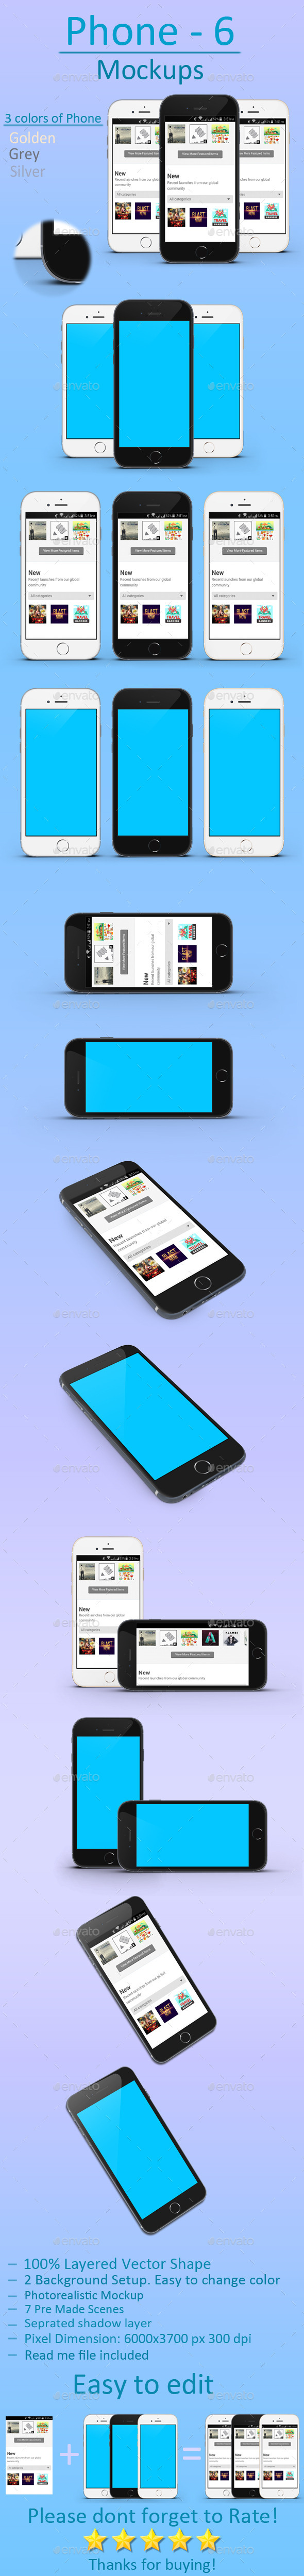 Phone 6 mockups